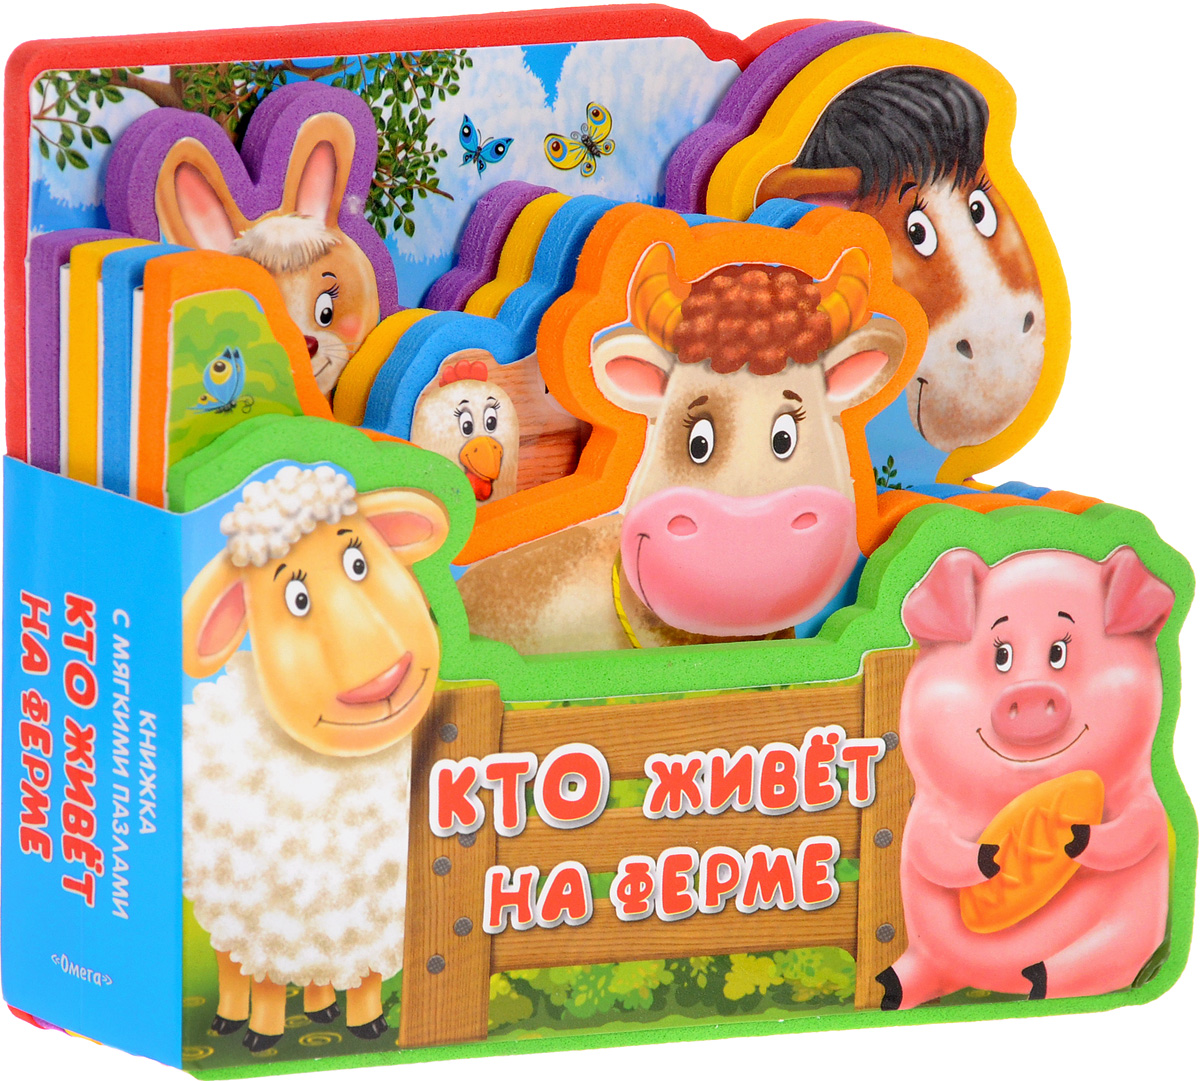 Кто живет на ферме. Книжка-игрушка